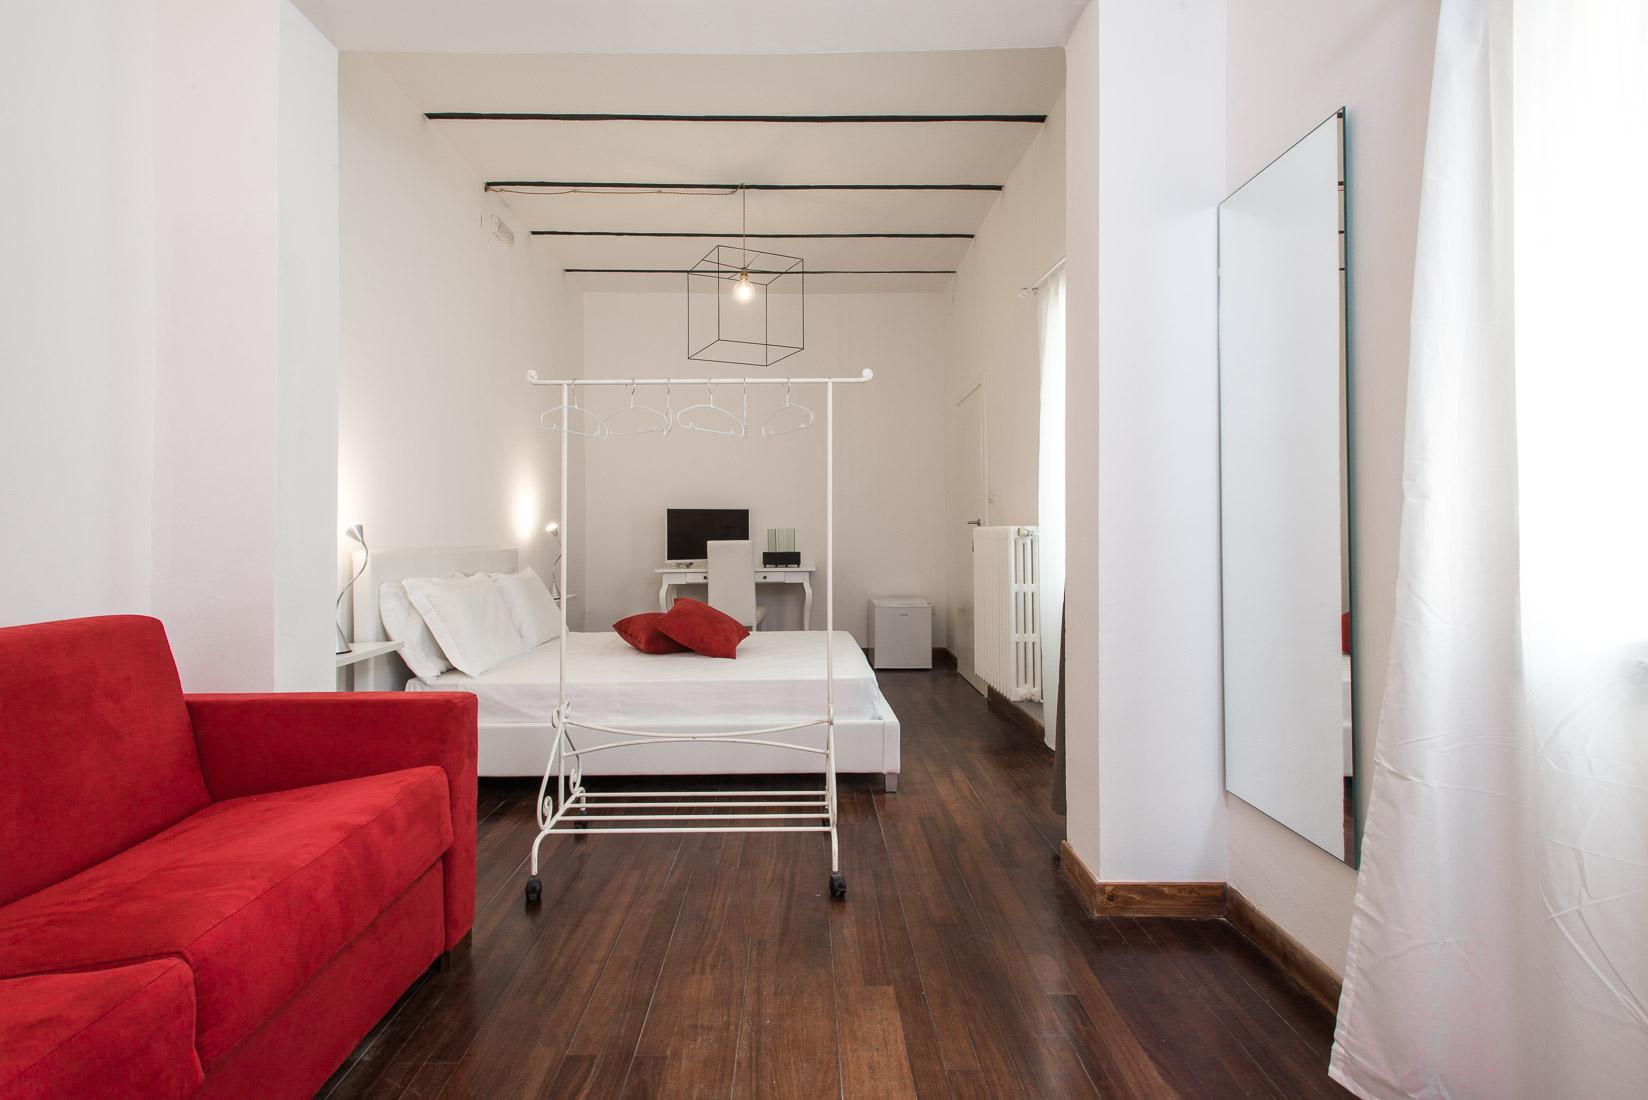 https://www.orlandinifrancesco.com/wp/wp-content/uploads/2019/01/Ada-Suite-Lecce-8.jpg